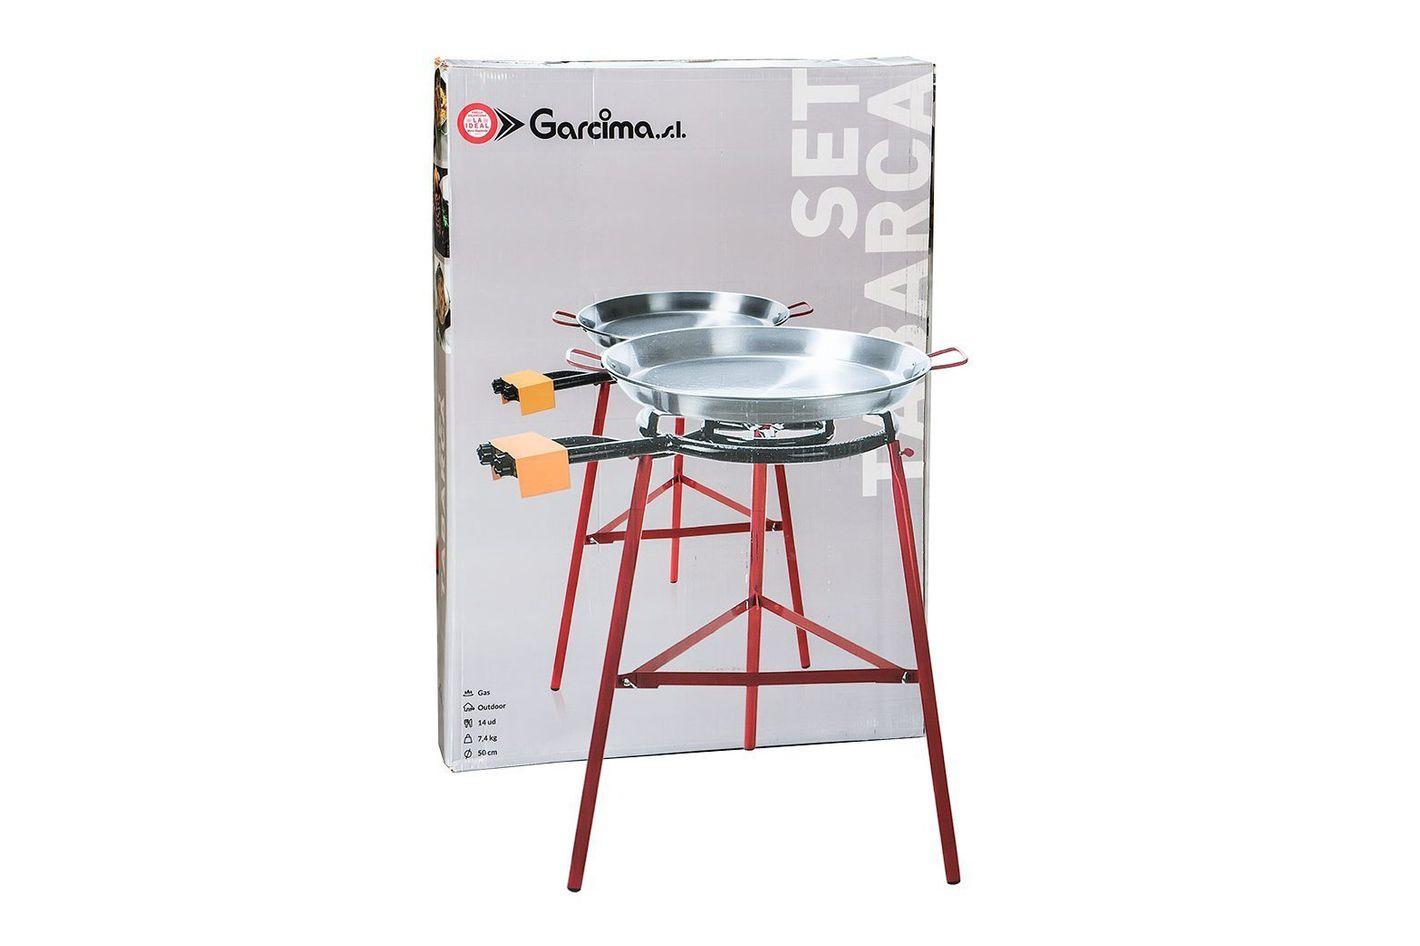 Paella Pan + Paella Burner and Stand Set